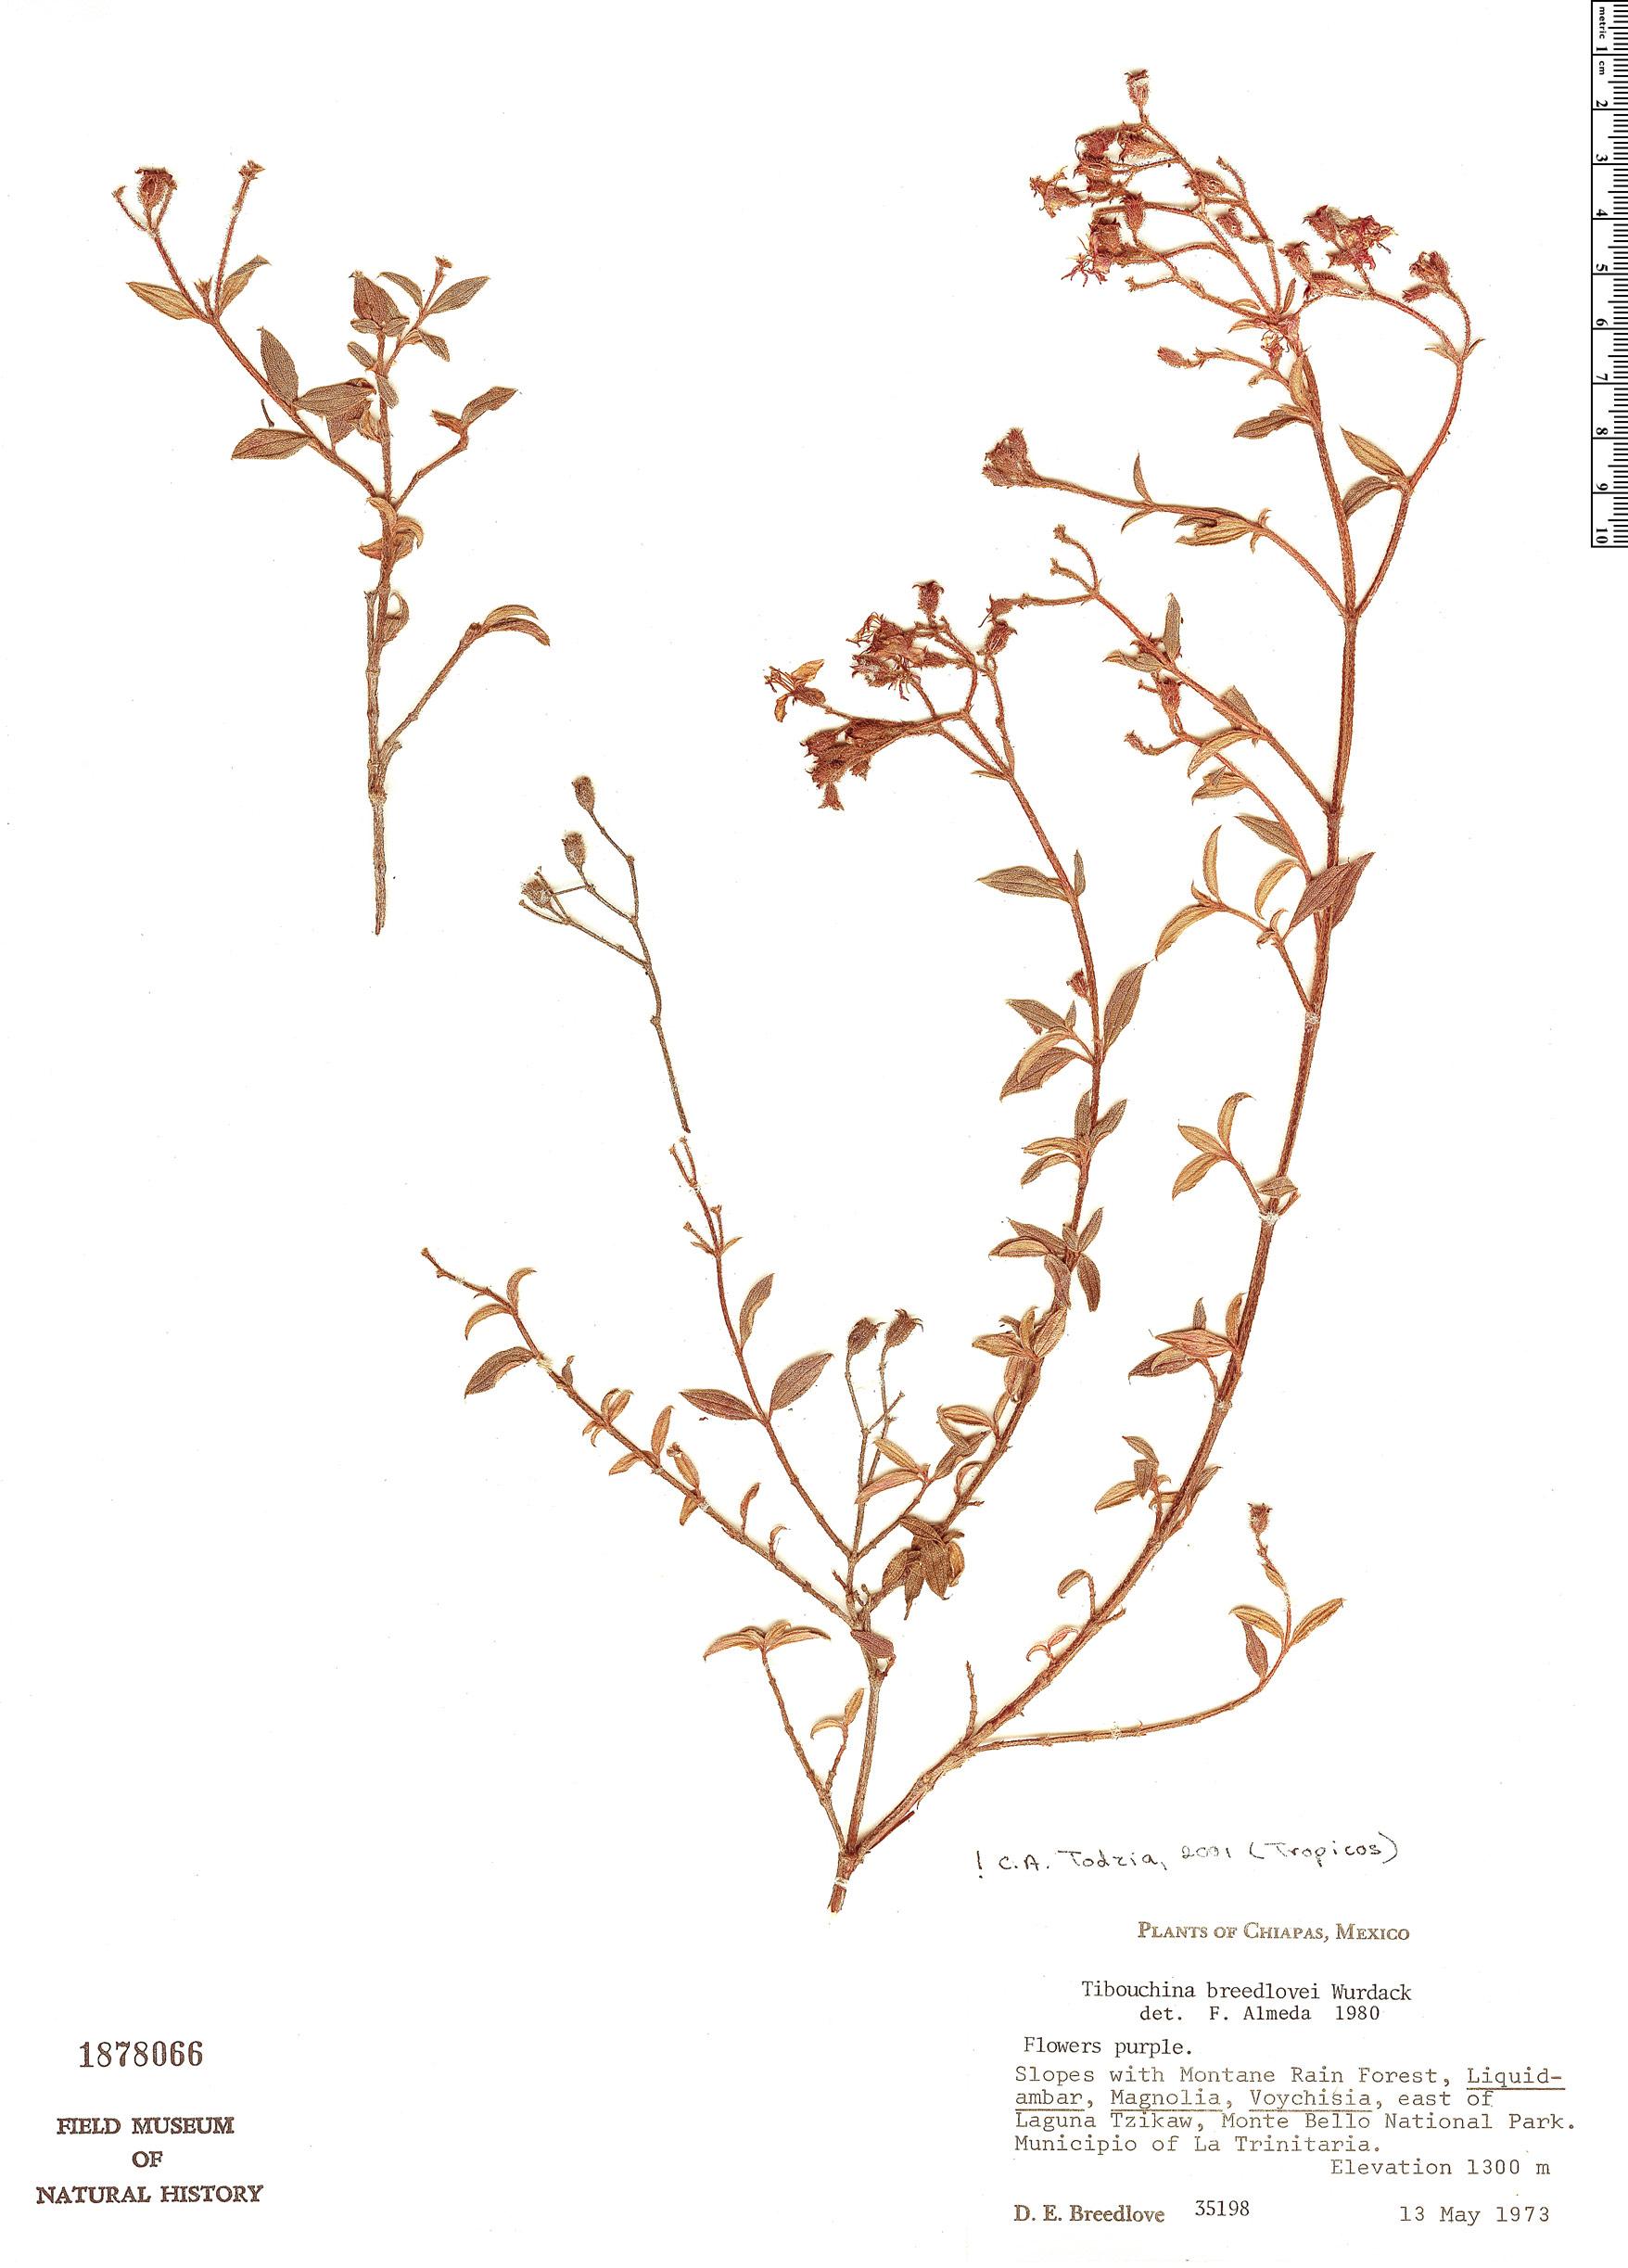 Specimen: Tibouchina breedlovei